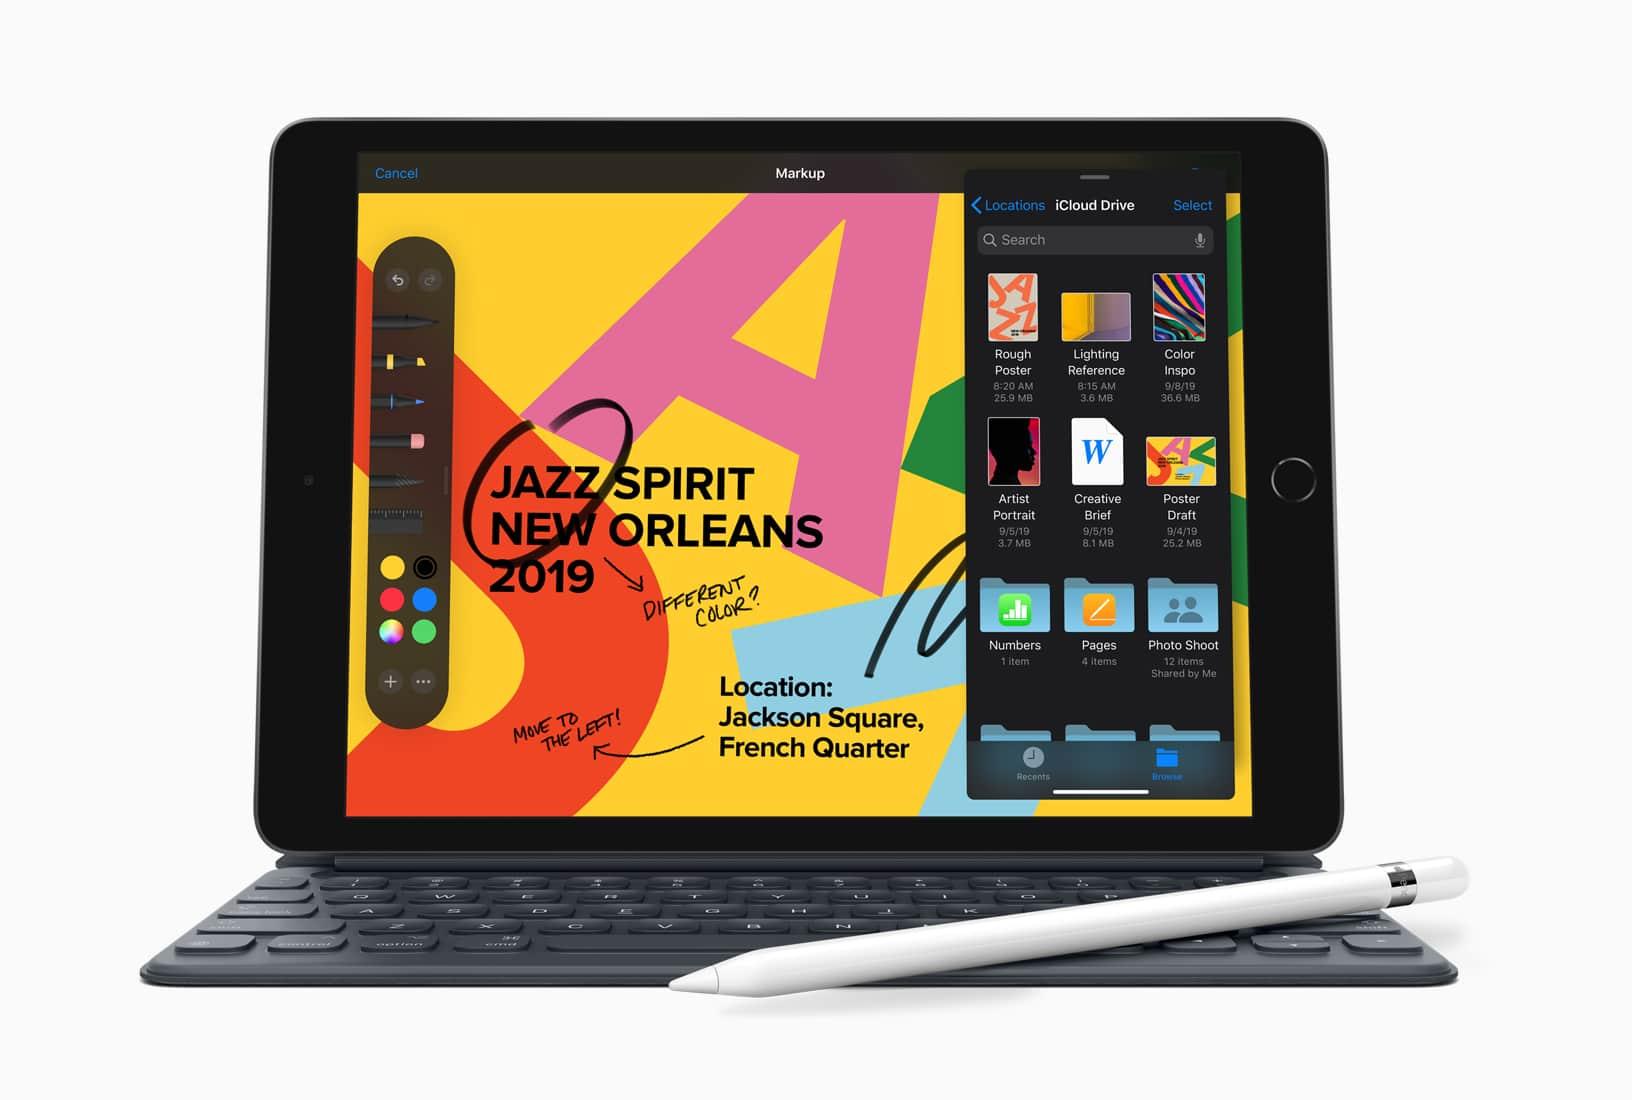 Novo iPad com Smart Keyboard e Apple Pencil